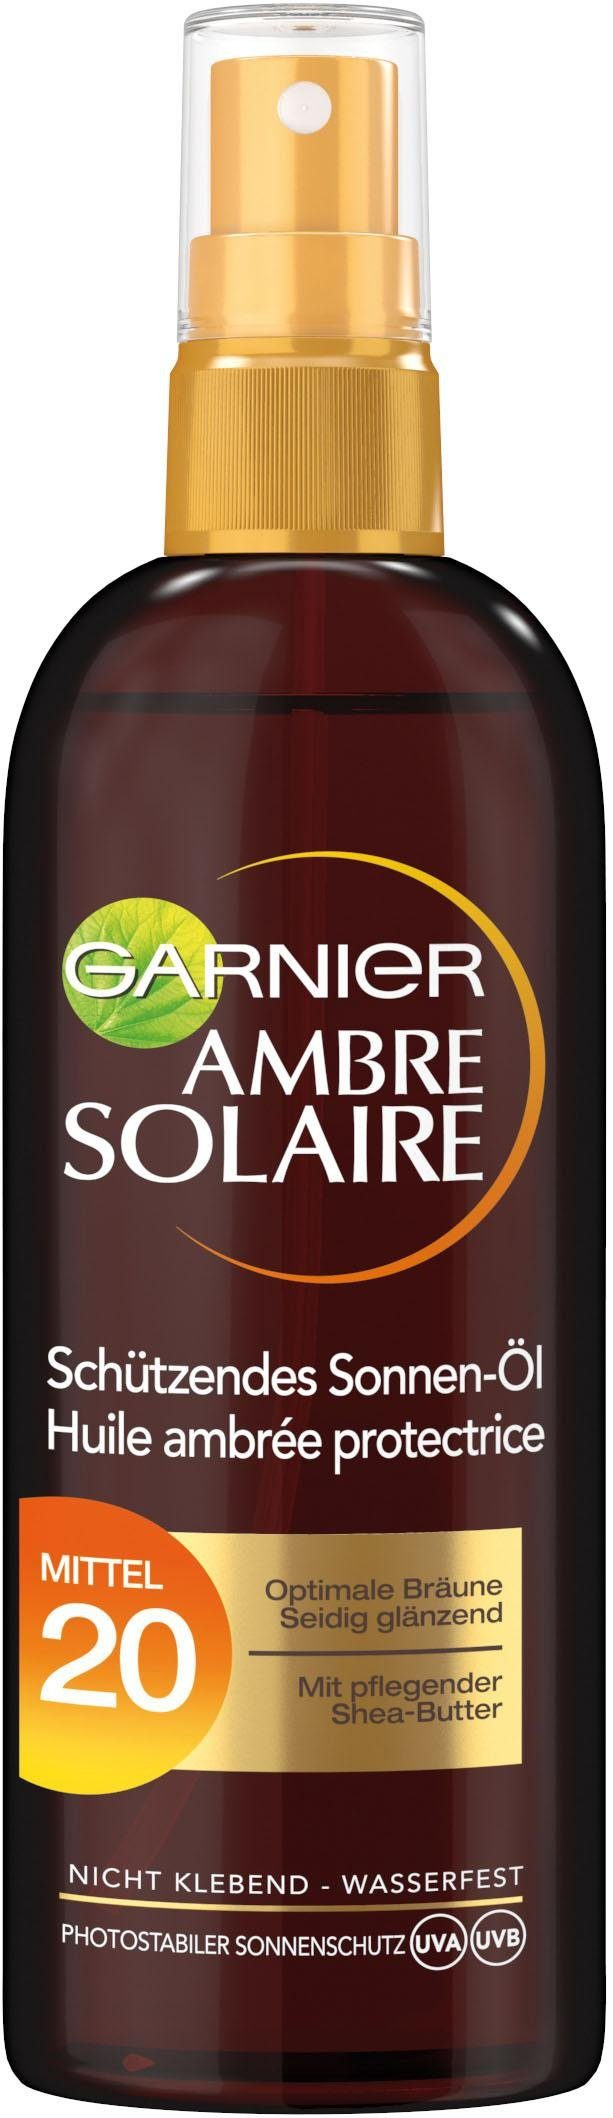 GARNIER Sonnenschutzöl »Ambre Solaire Bräunungsöl-Spray LSF 20«